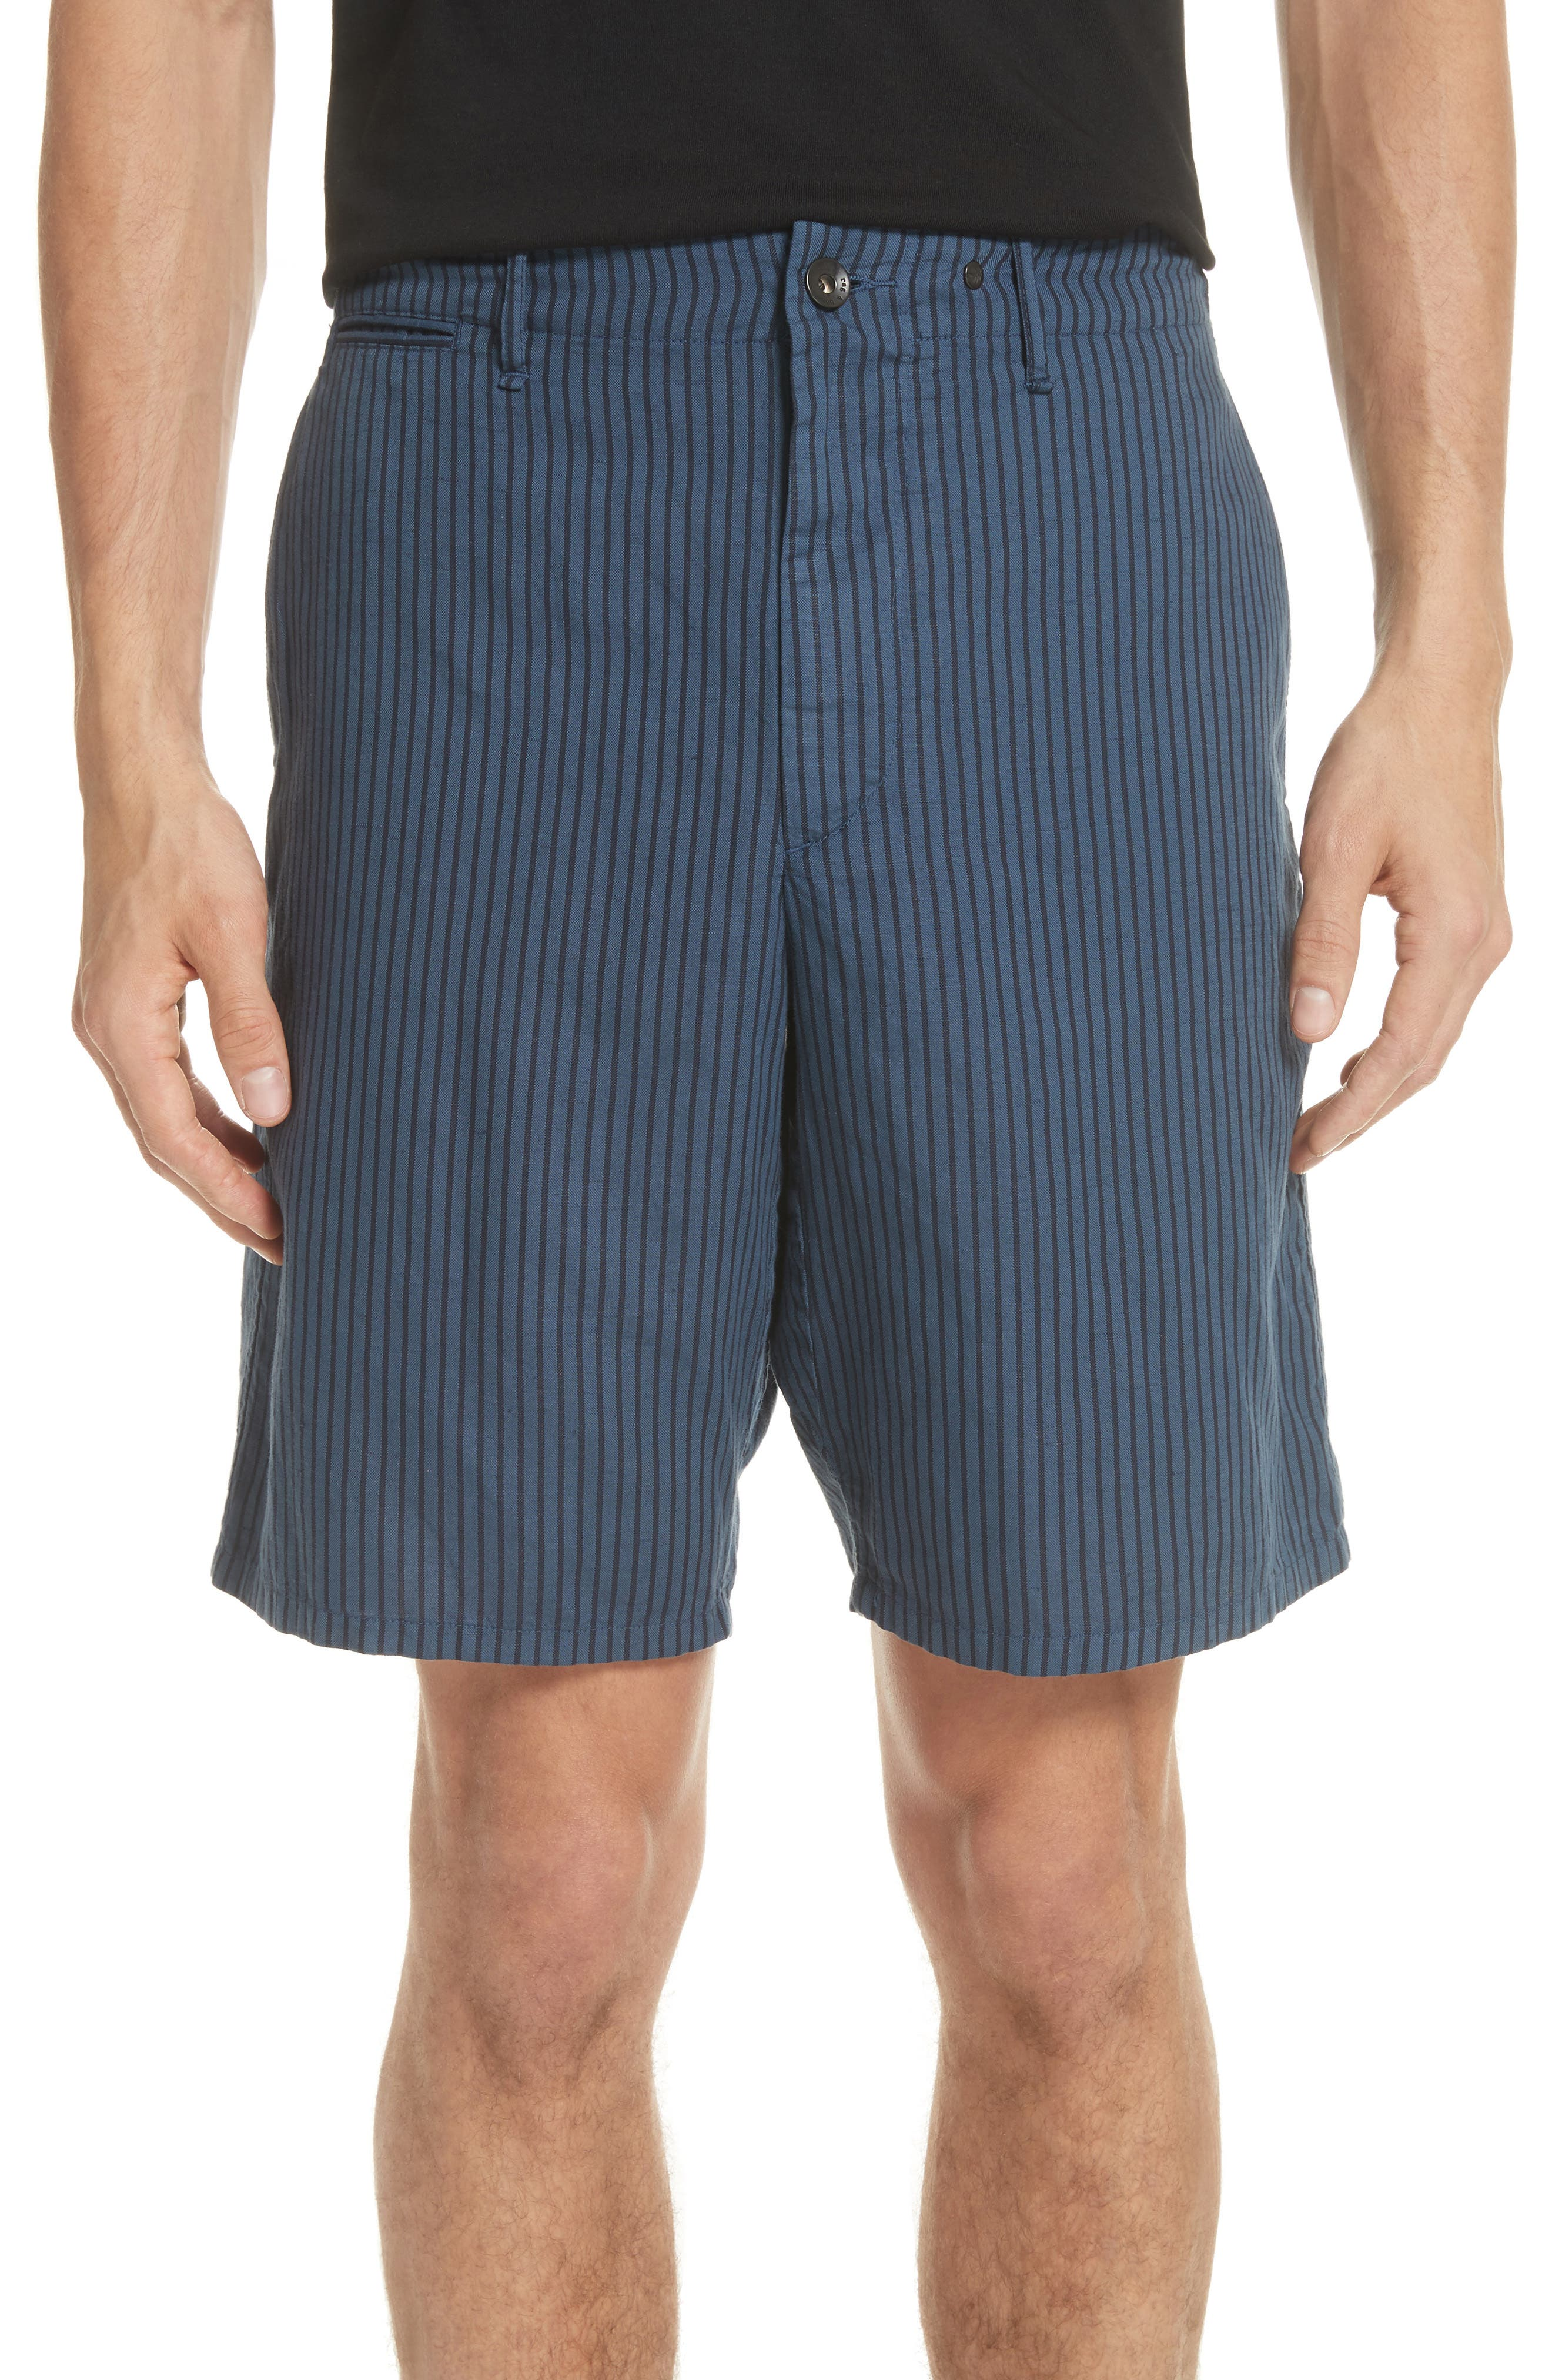 rag + bone Stripe Shorts,                         Main,                         color, Navy Stripe